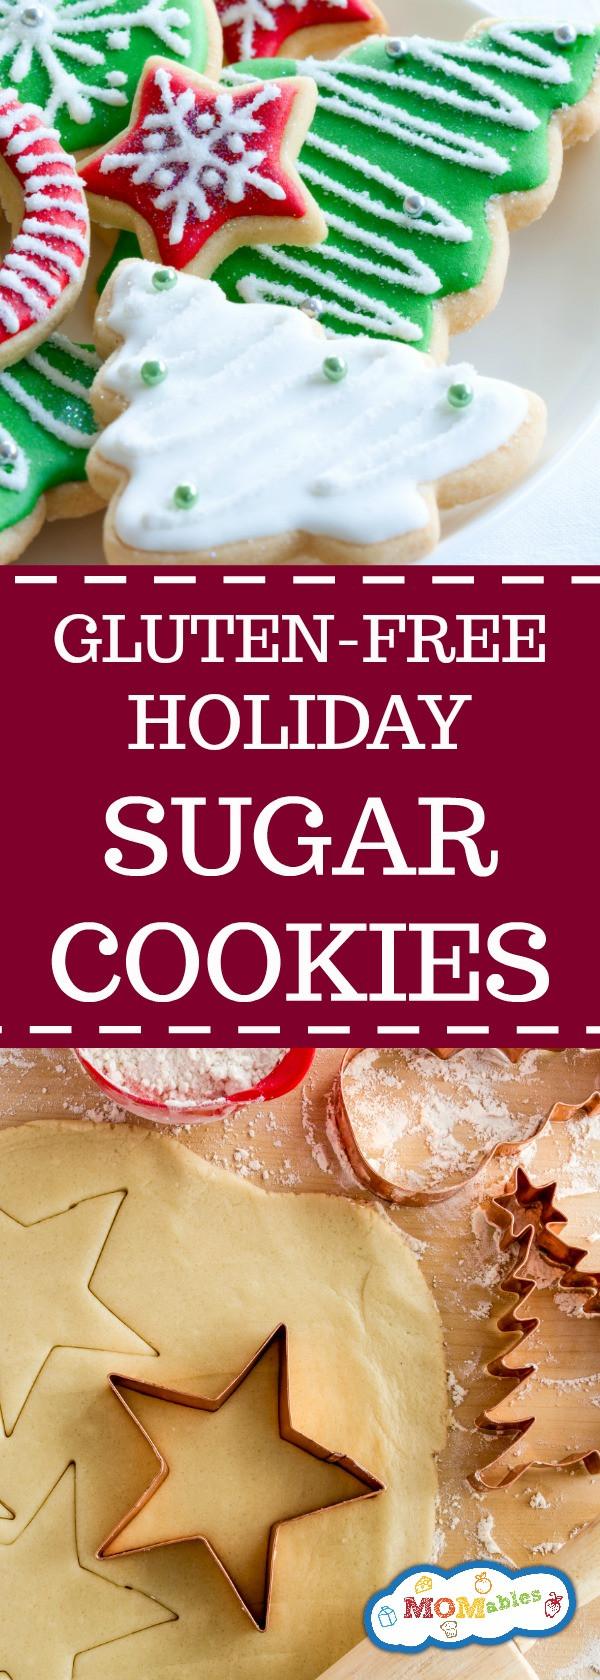 Sugar Free Christmas Cookie Recipes  Gluten Free Sugar Cookie Recipe